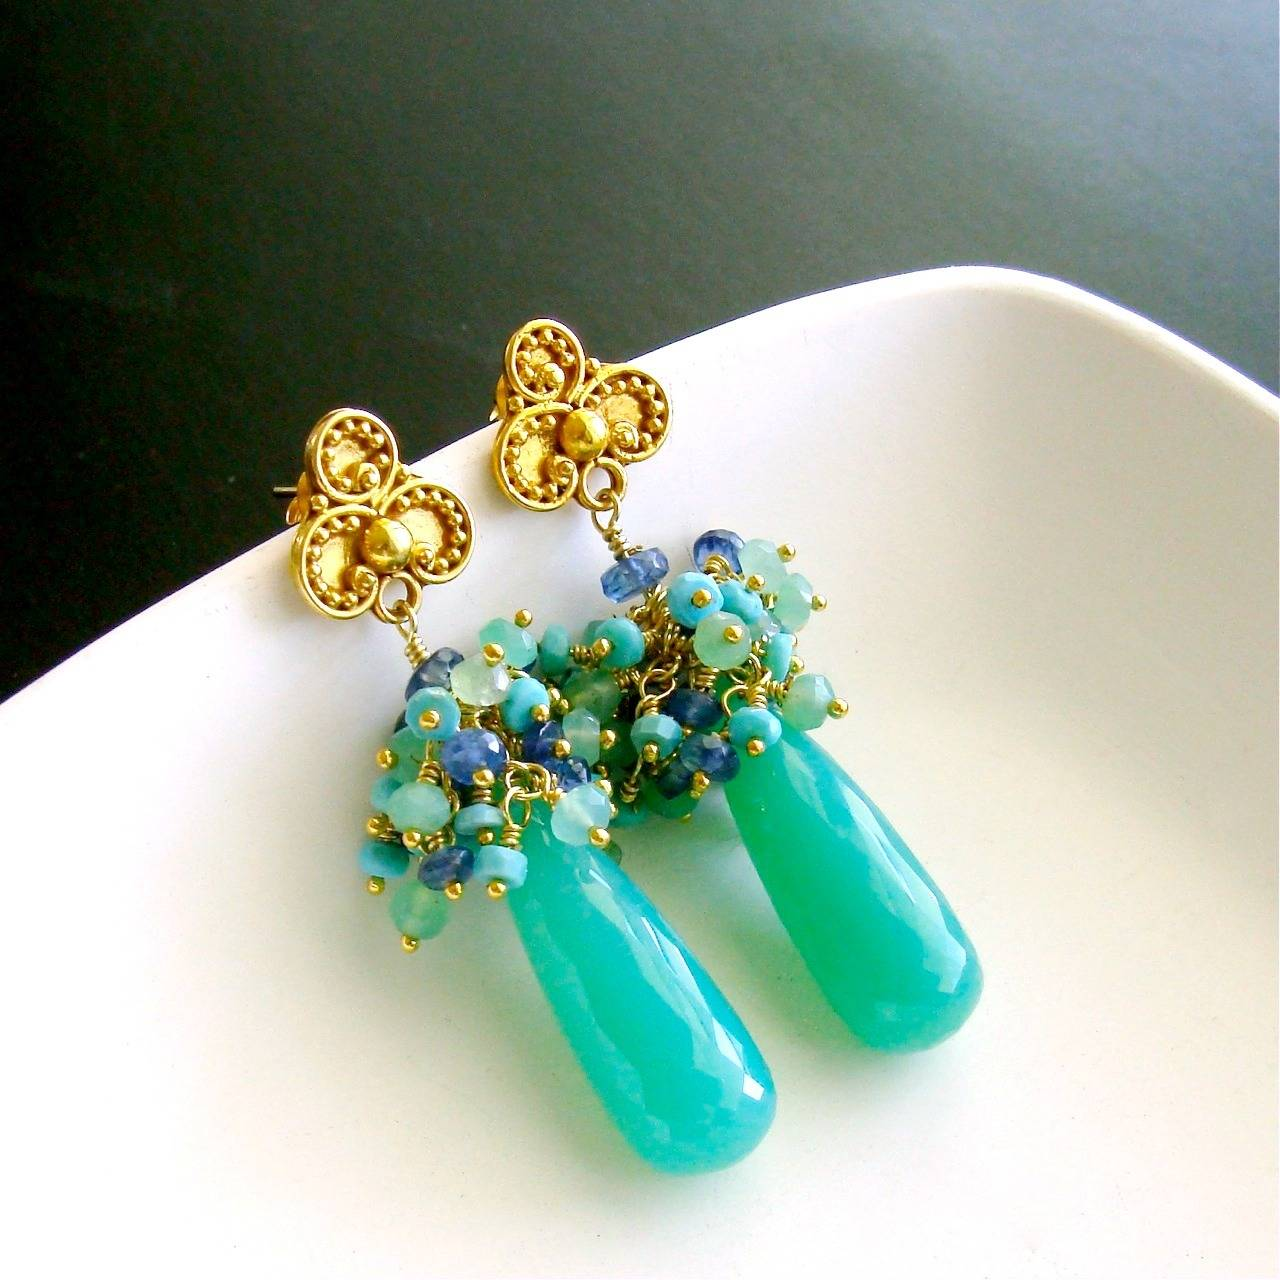 Chrysoprase Sleeping Beauty Turquoise Kyanite Cluster Post Style Earrings 2